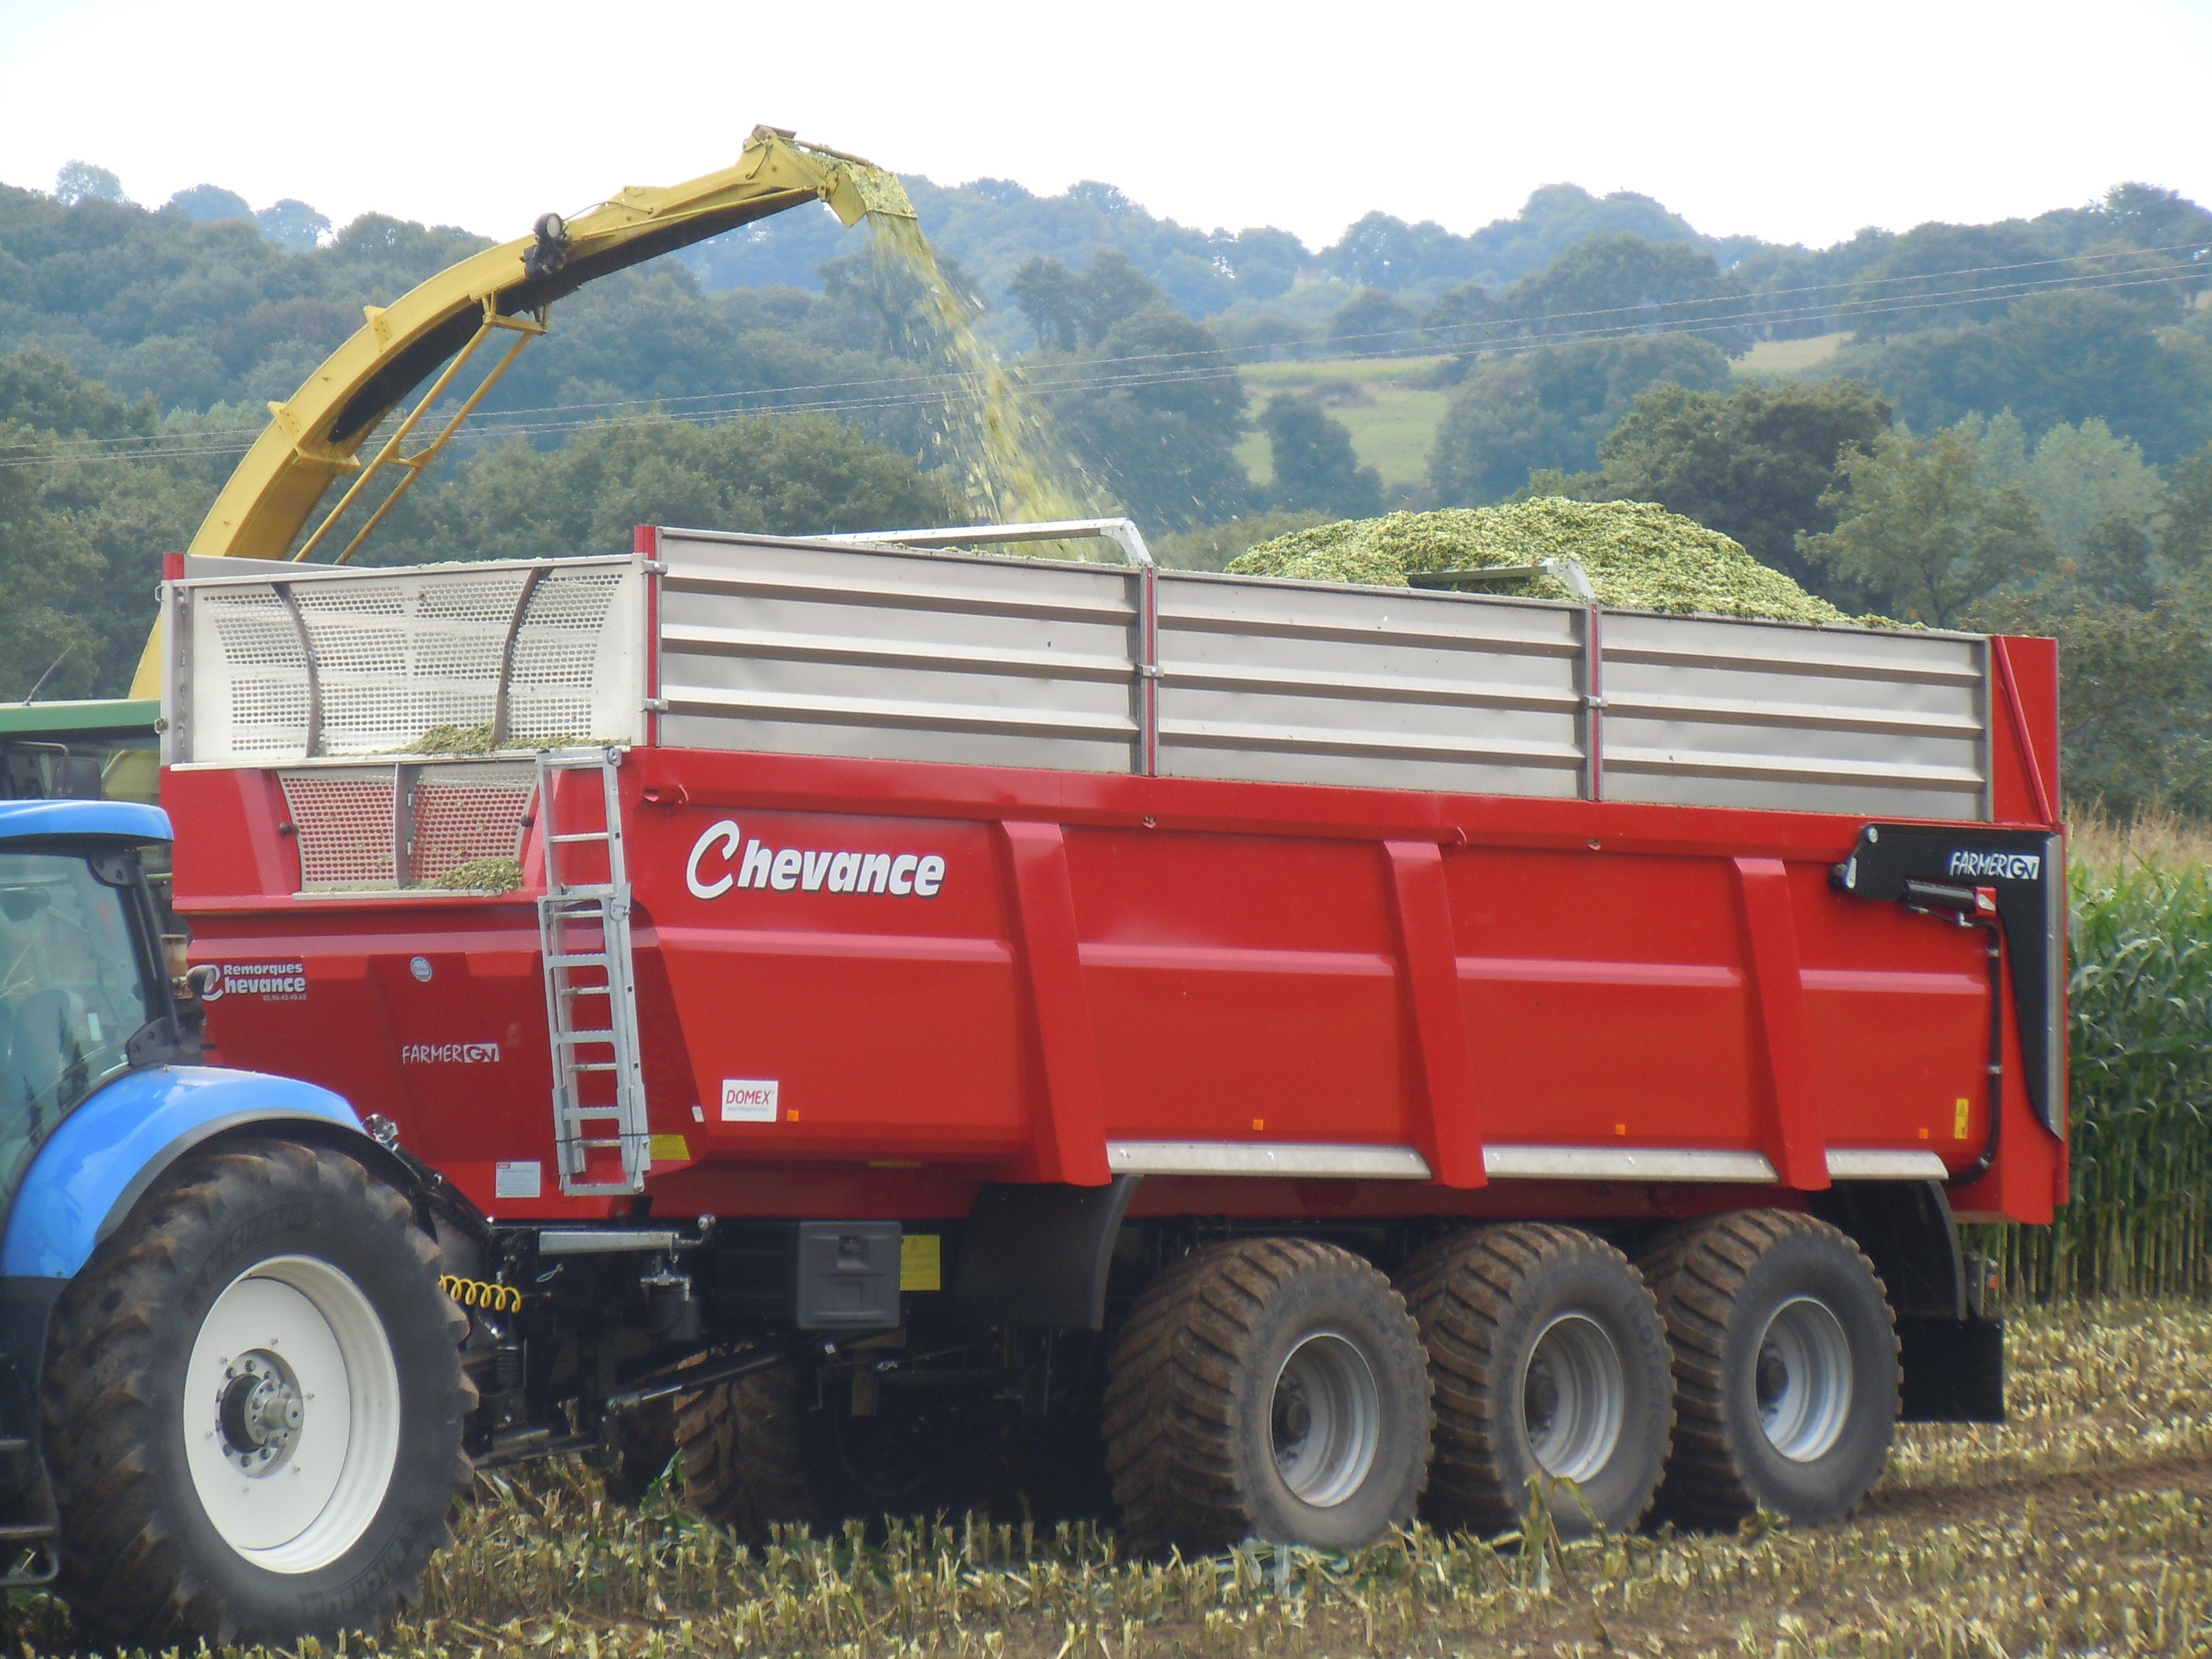 RCM 230 FARMER GV 900